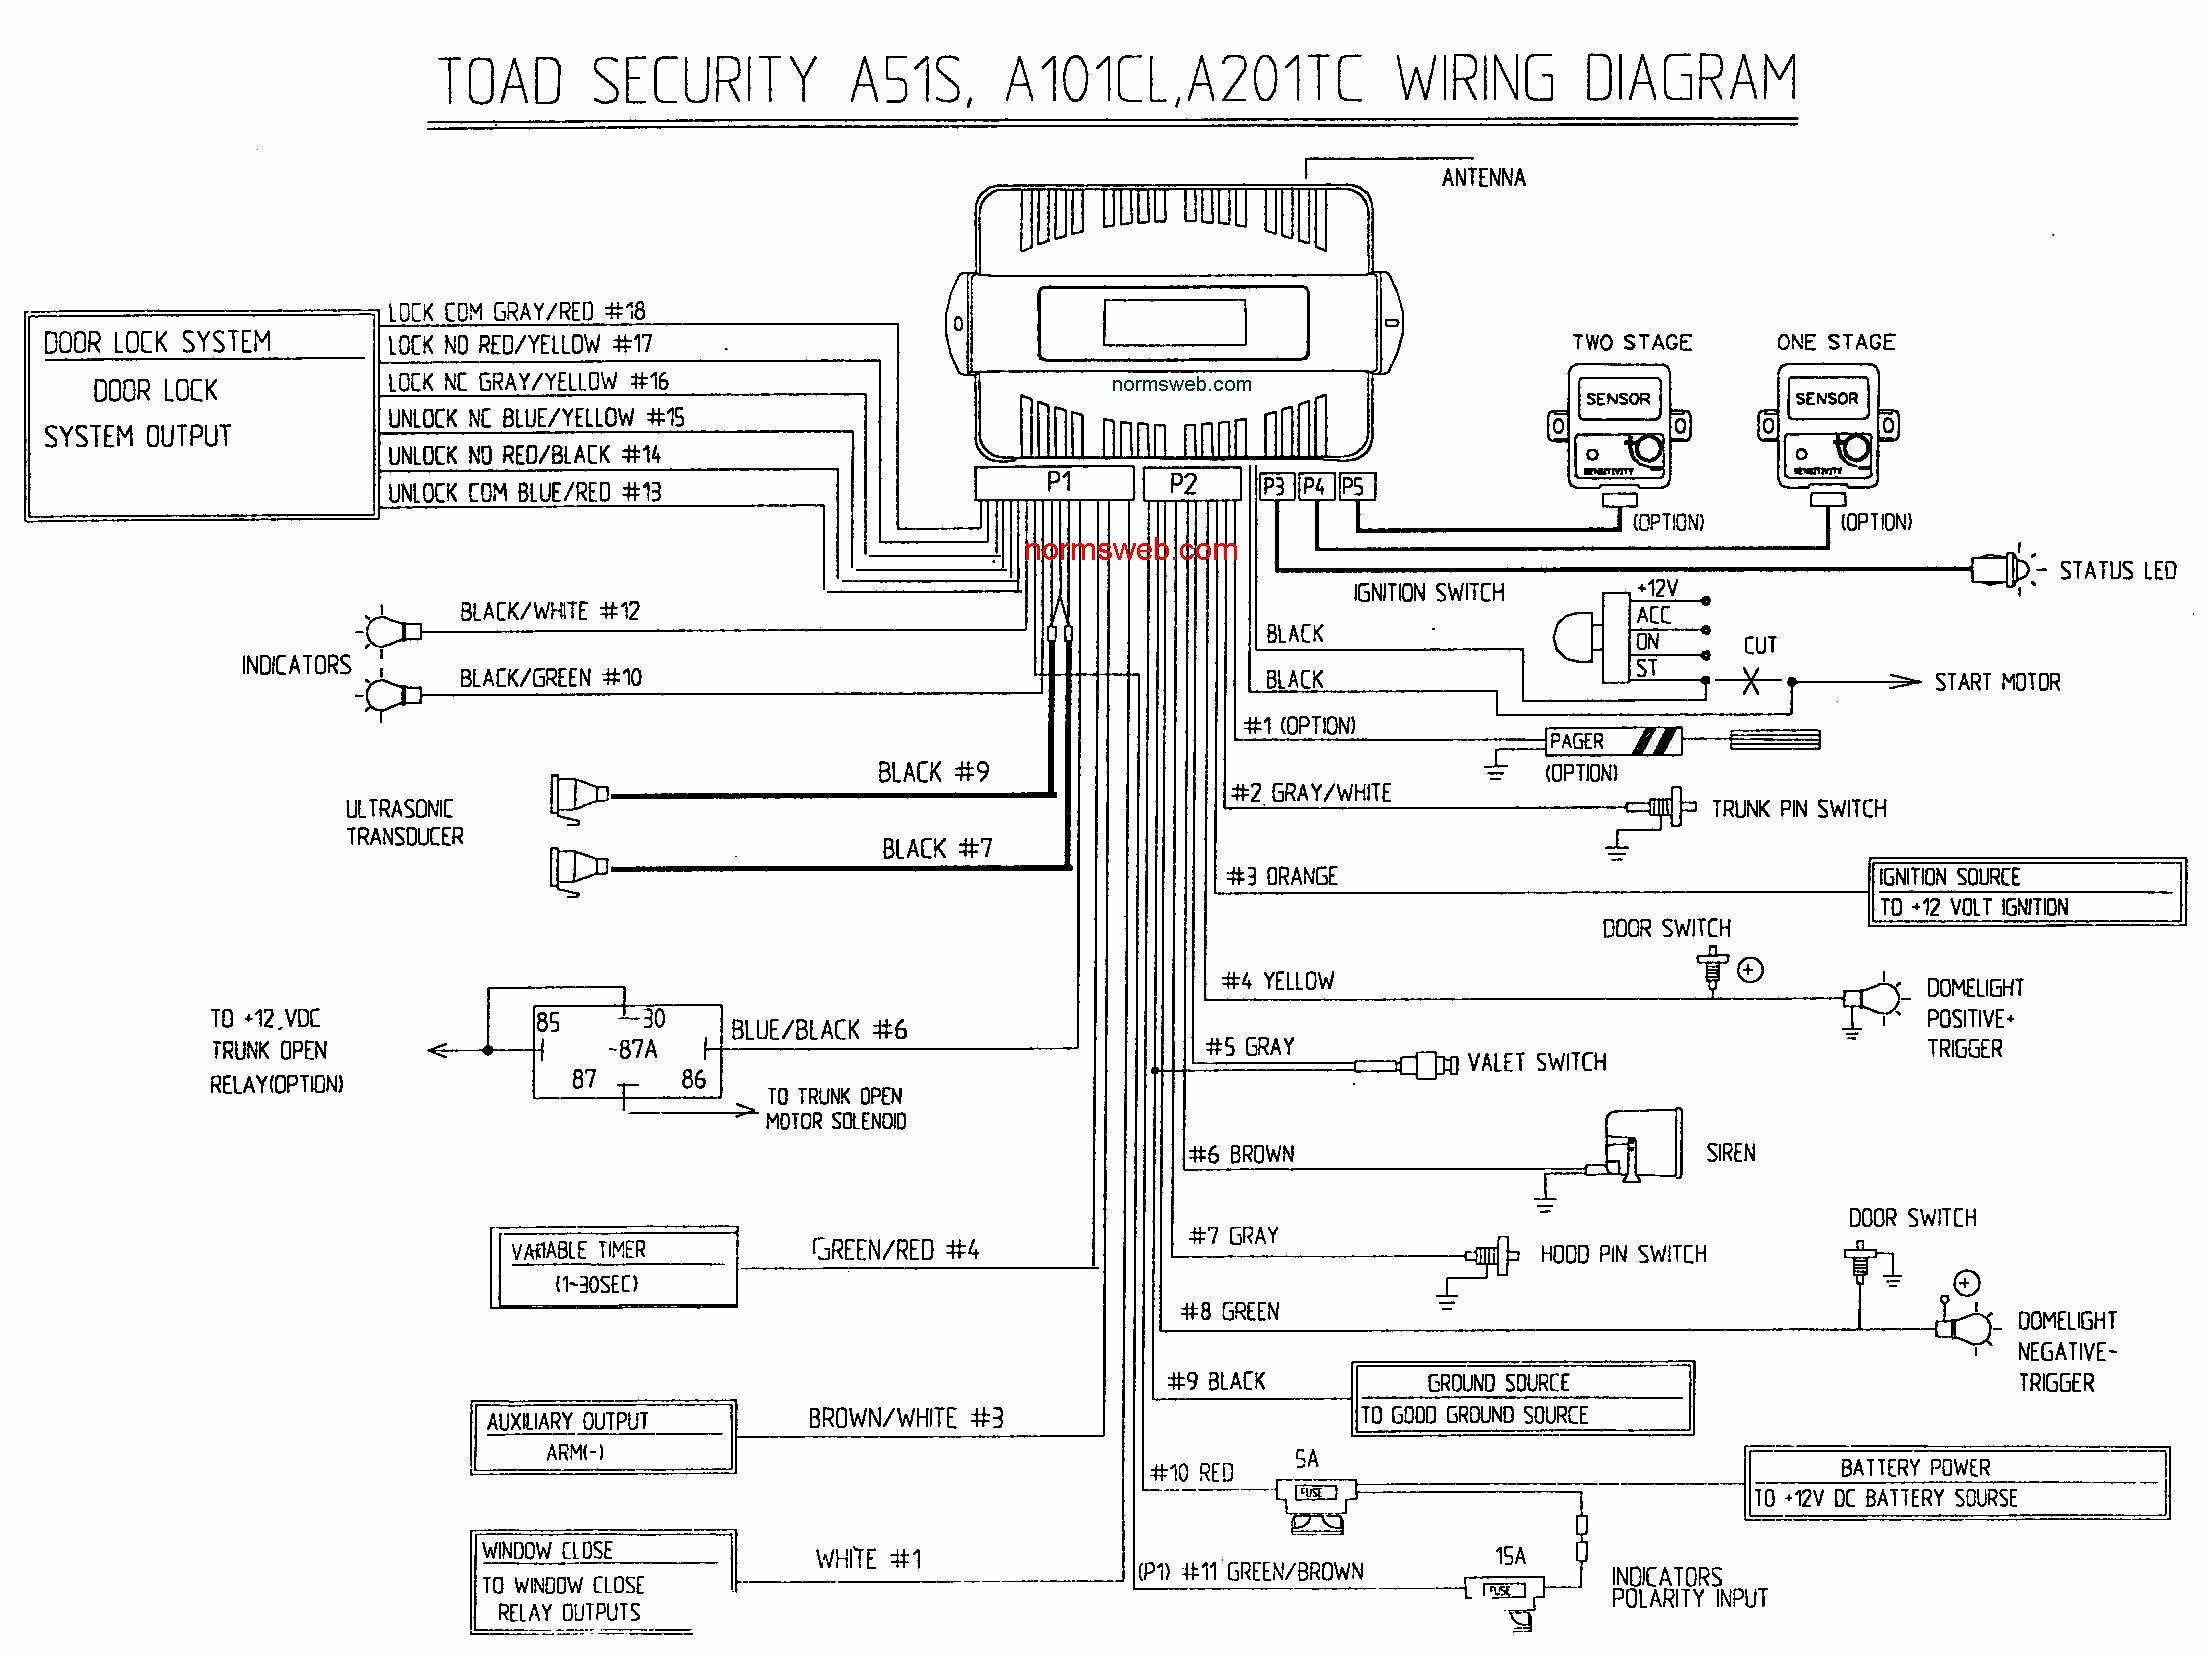 bulldog car alarm wiring diagram Download-Wiring Diagram Intruder Alarm New Wiring Diagram Car Alarm Wiring Diagram Unique Bulldog Security 8-j